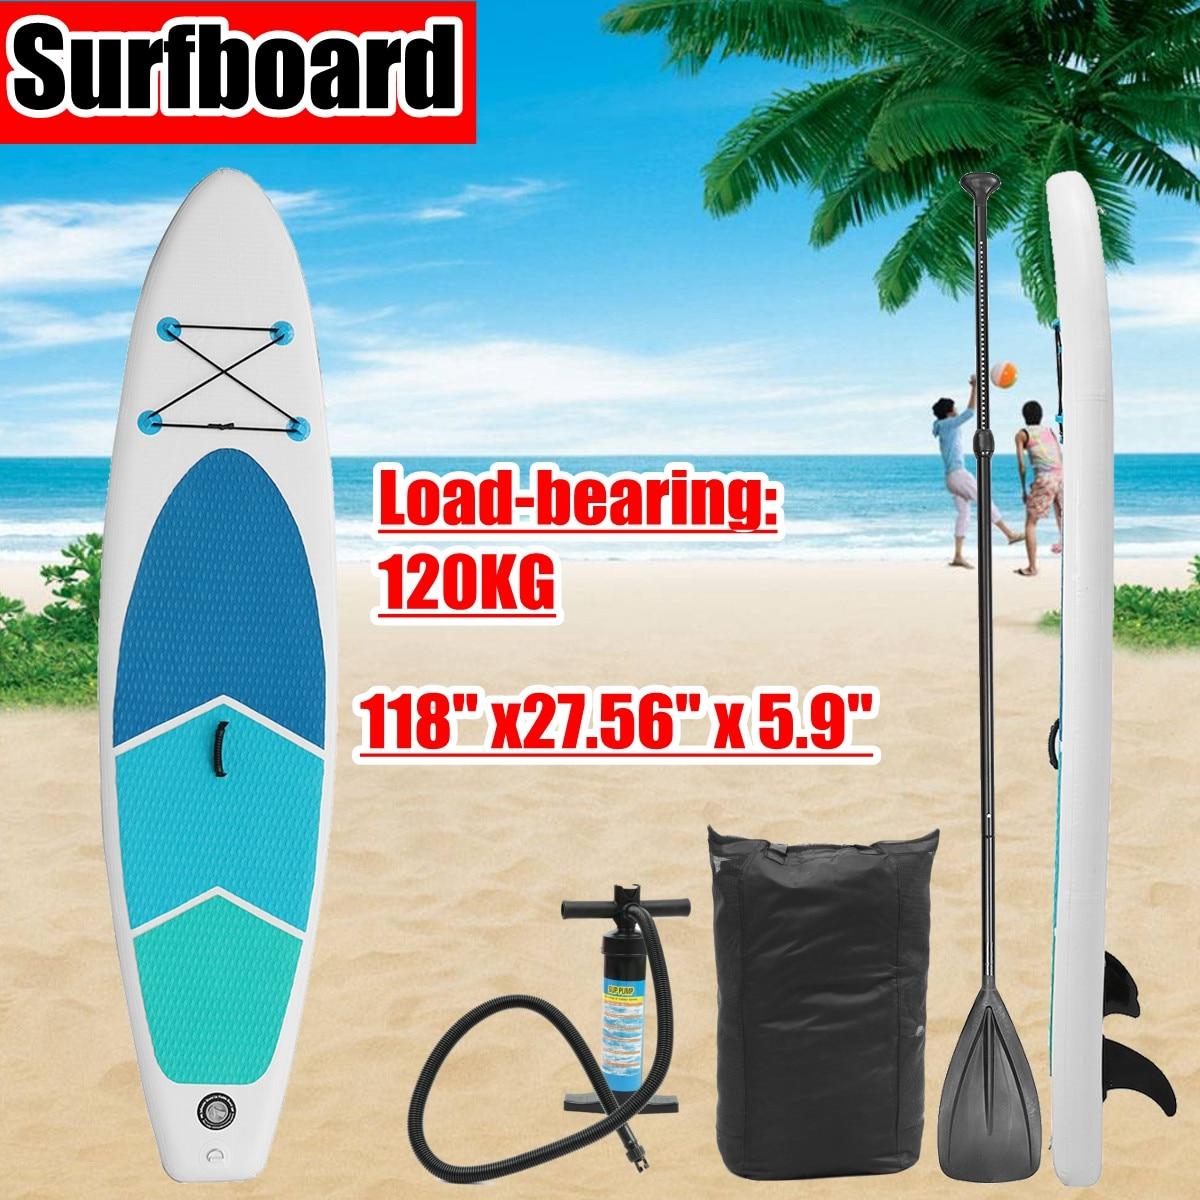 Gofun 3 m X 0.7 m X 0.15 m Pollici Stand Up Paddle Bordo Tavola Da Surf Gonfiabile SUP Set Onda R ider + Pompa gonfiabile tavola da surf paddle barca